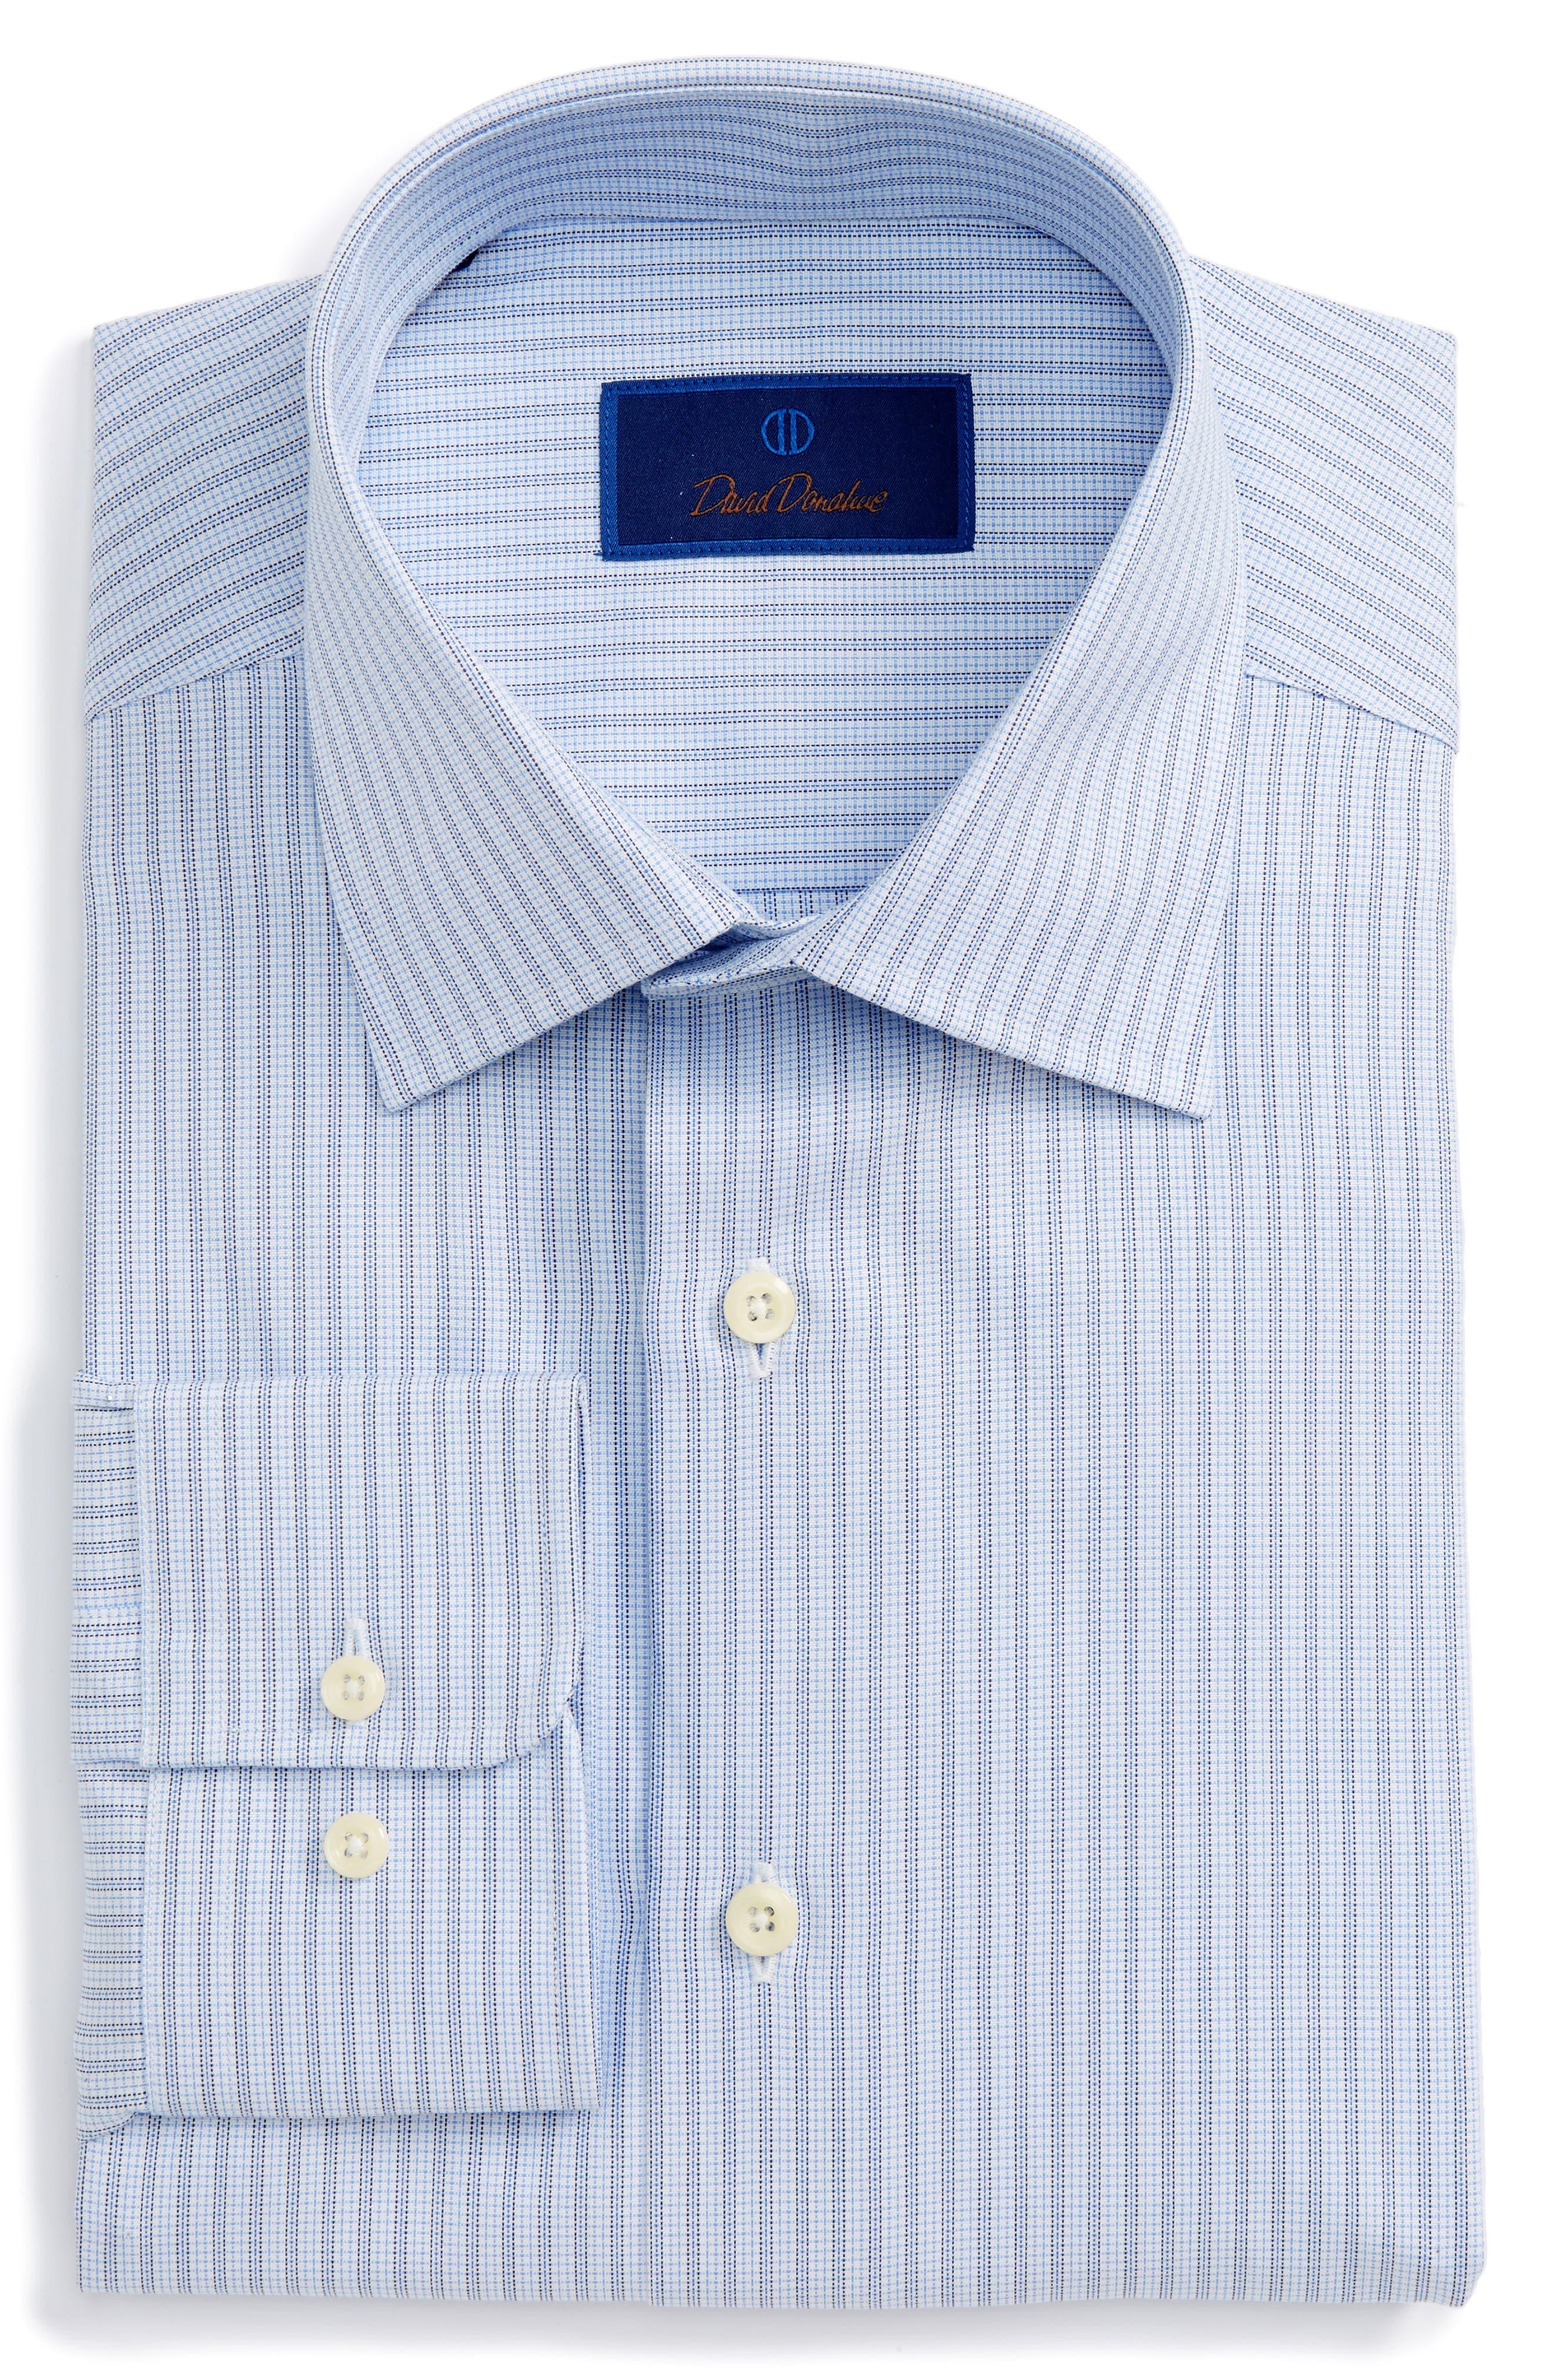 Regular Fit Stripe Dress Shirt,                             Main thumbnail 1, color,                             Sky/ Navy